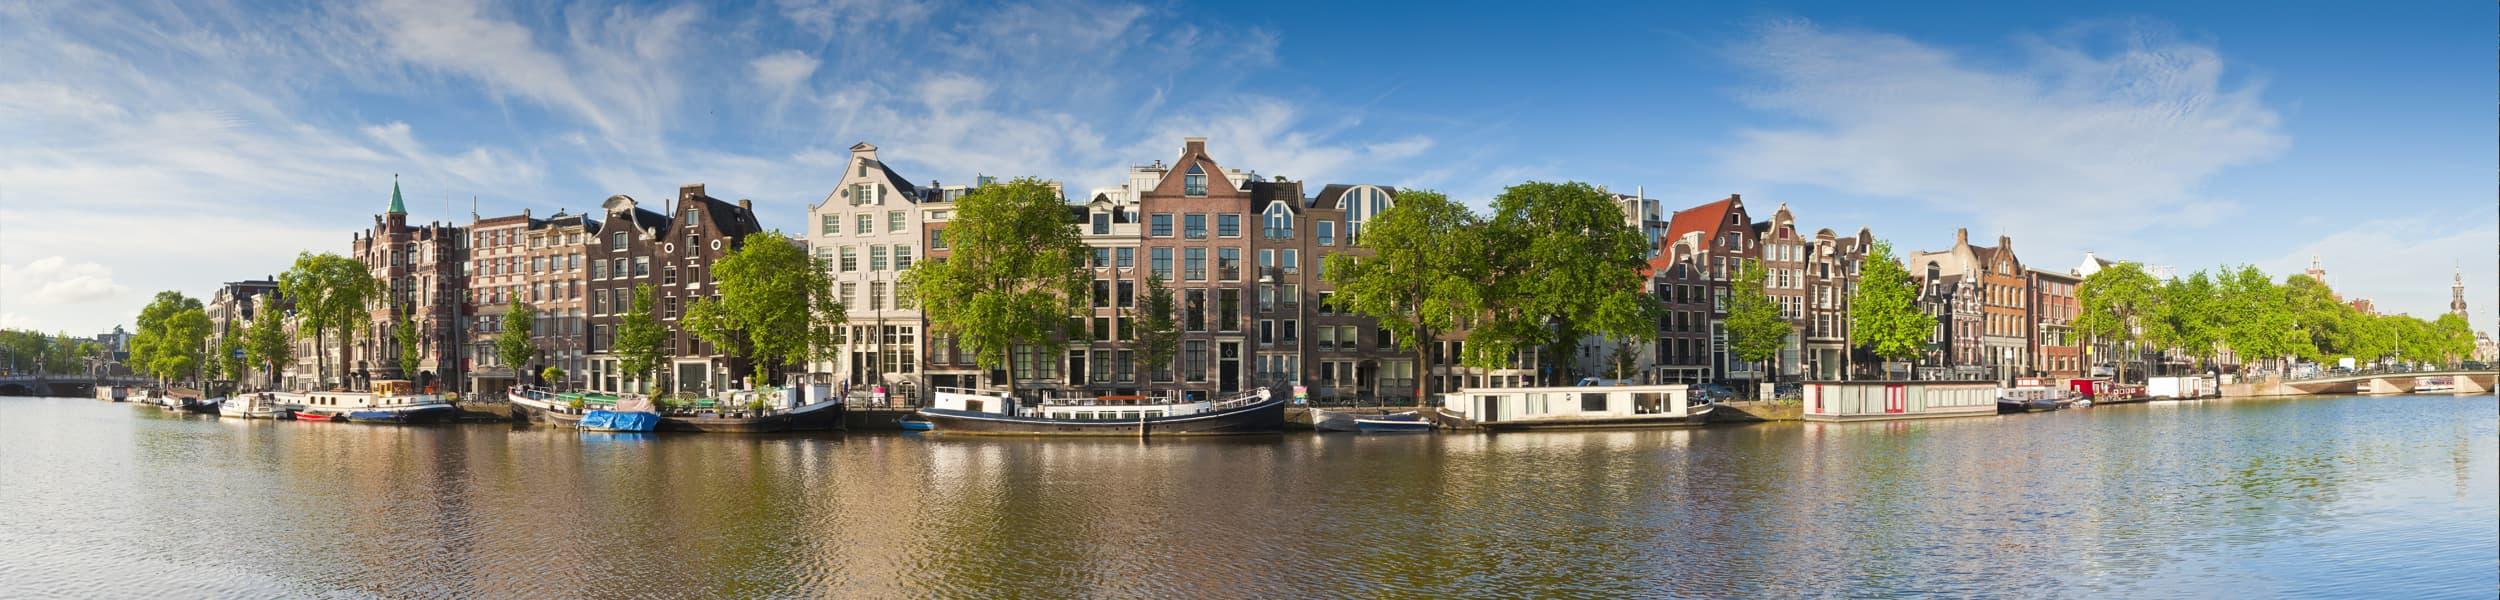 Digital Architect Amsterdam, The Netherlands